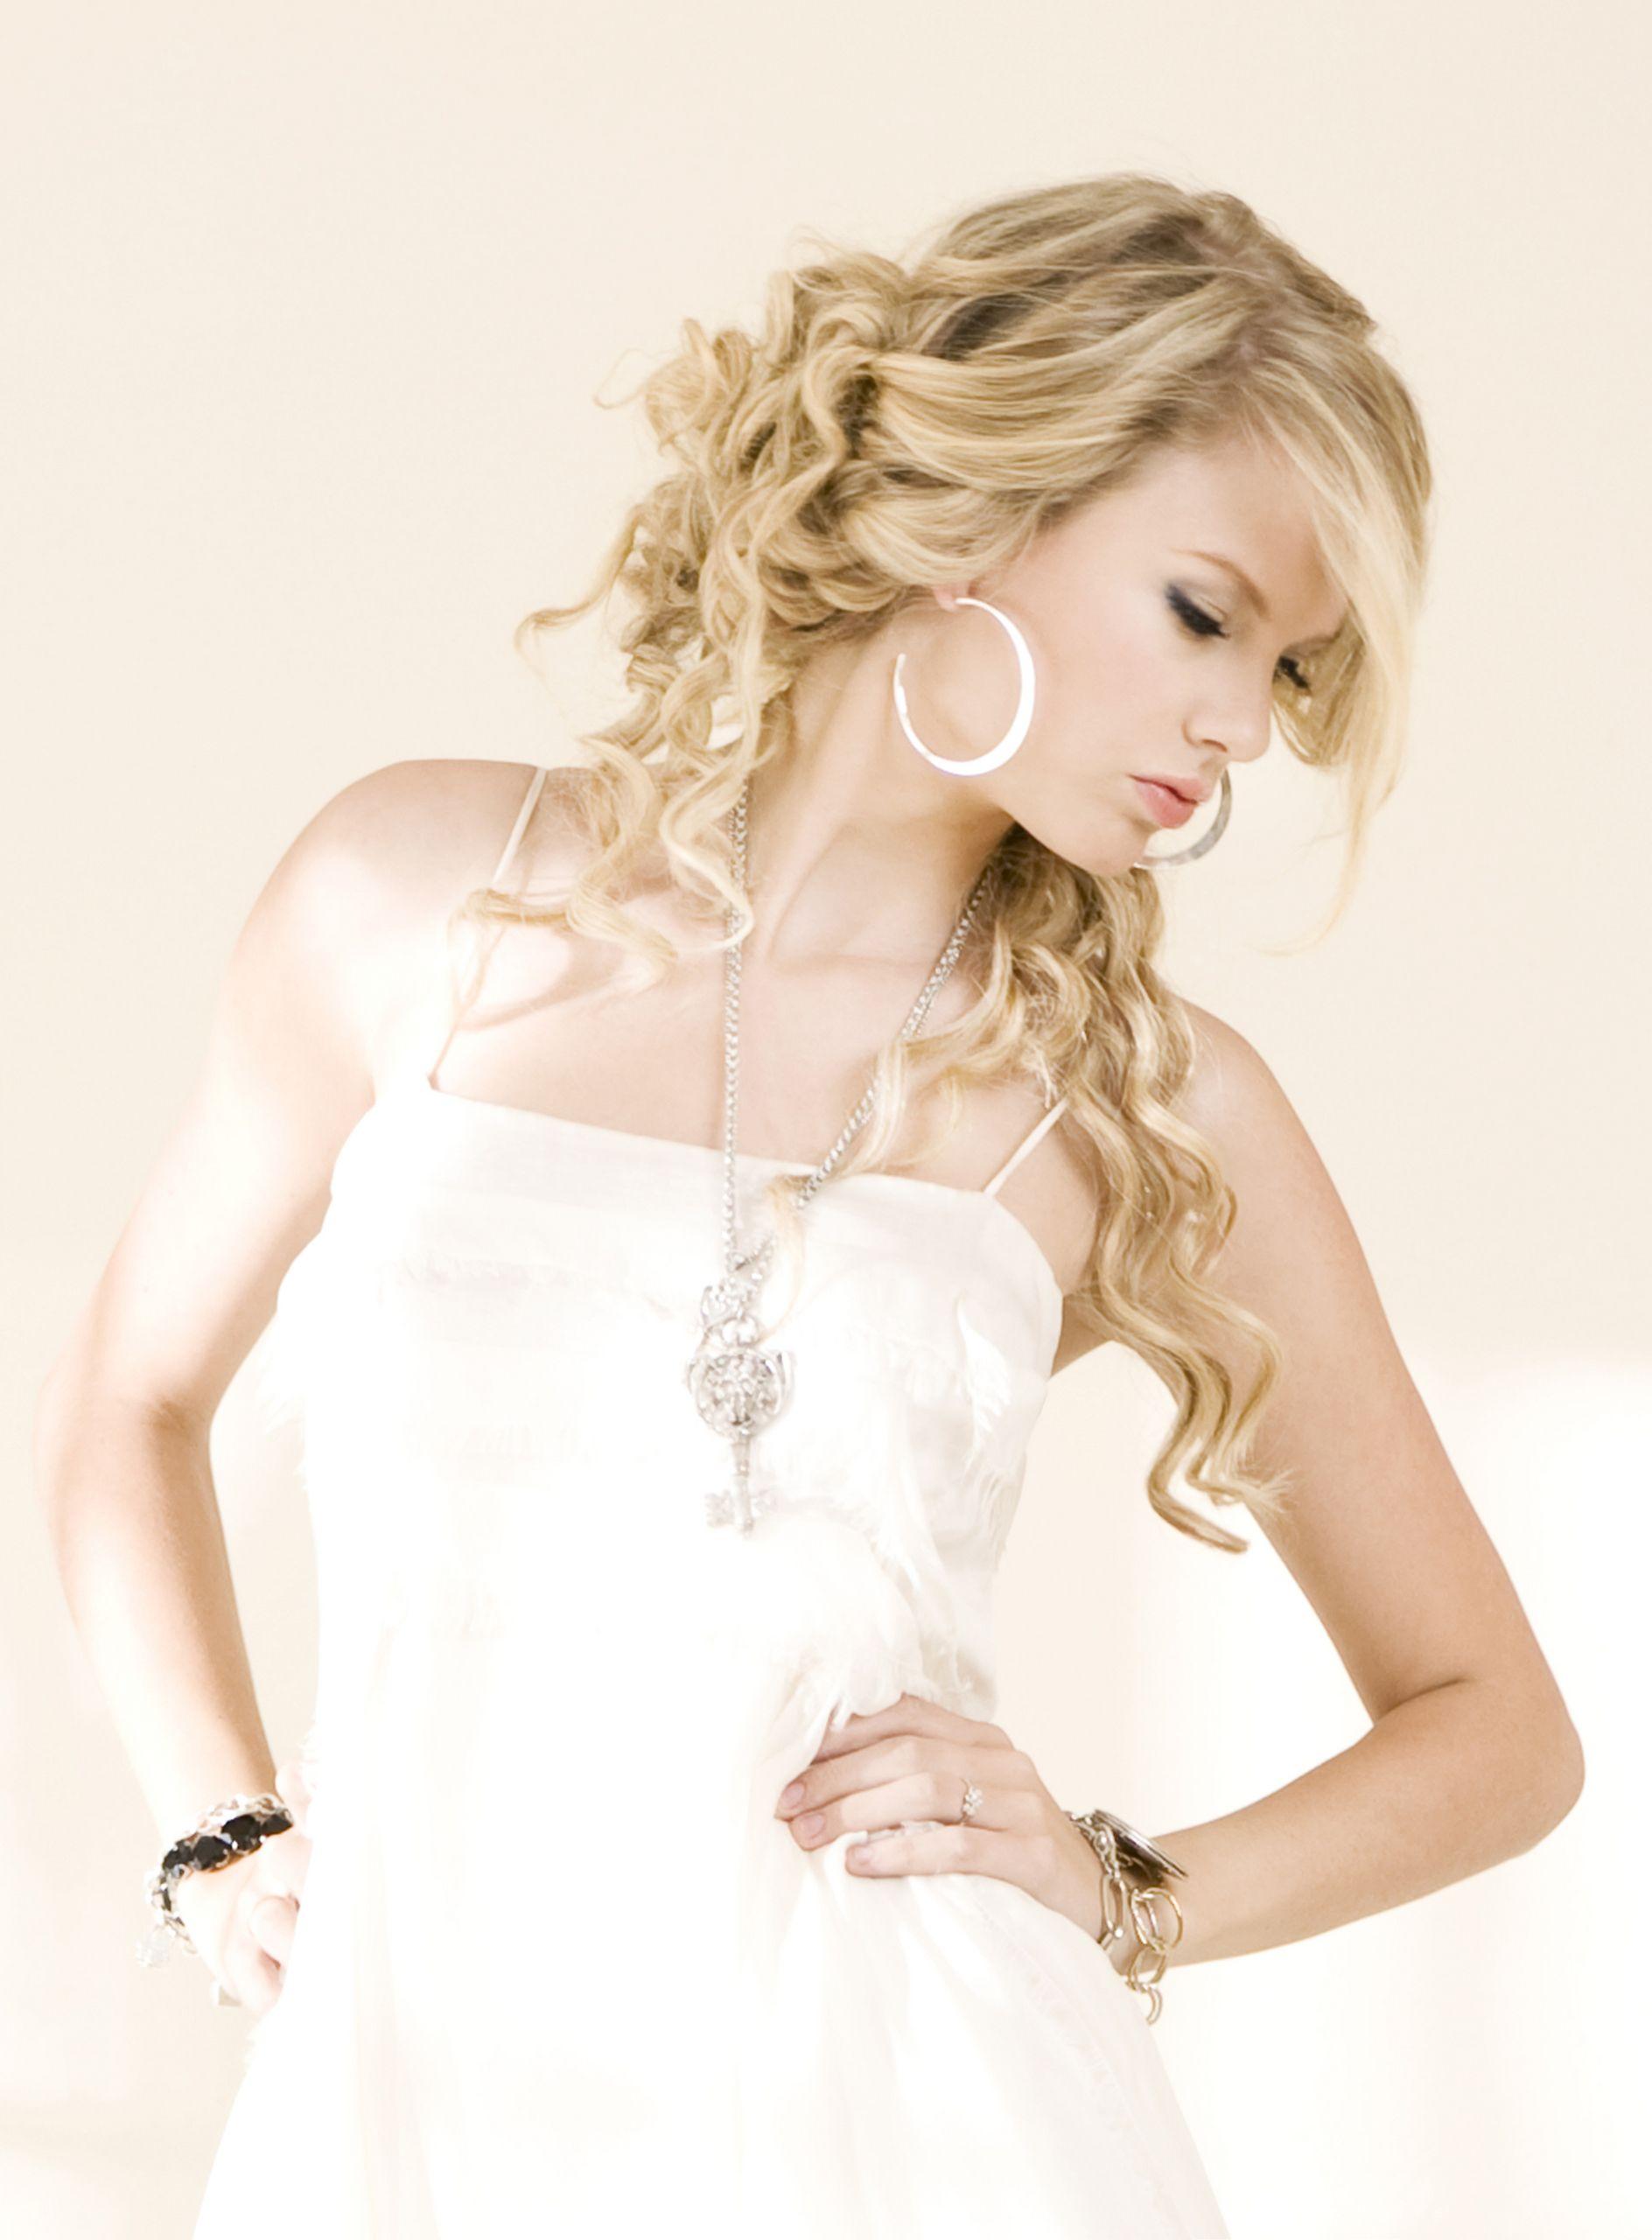 Fearless Taylor Swift Album Photo Fearless Photoshoot Taylor Swift Album Taylor Swift Hair Taylor Swift Fearless